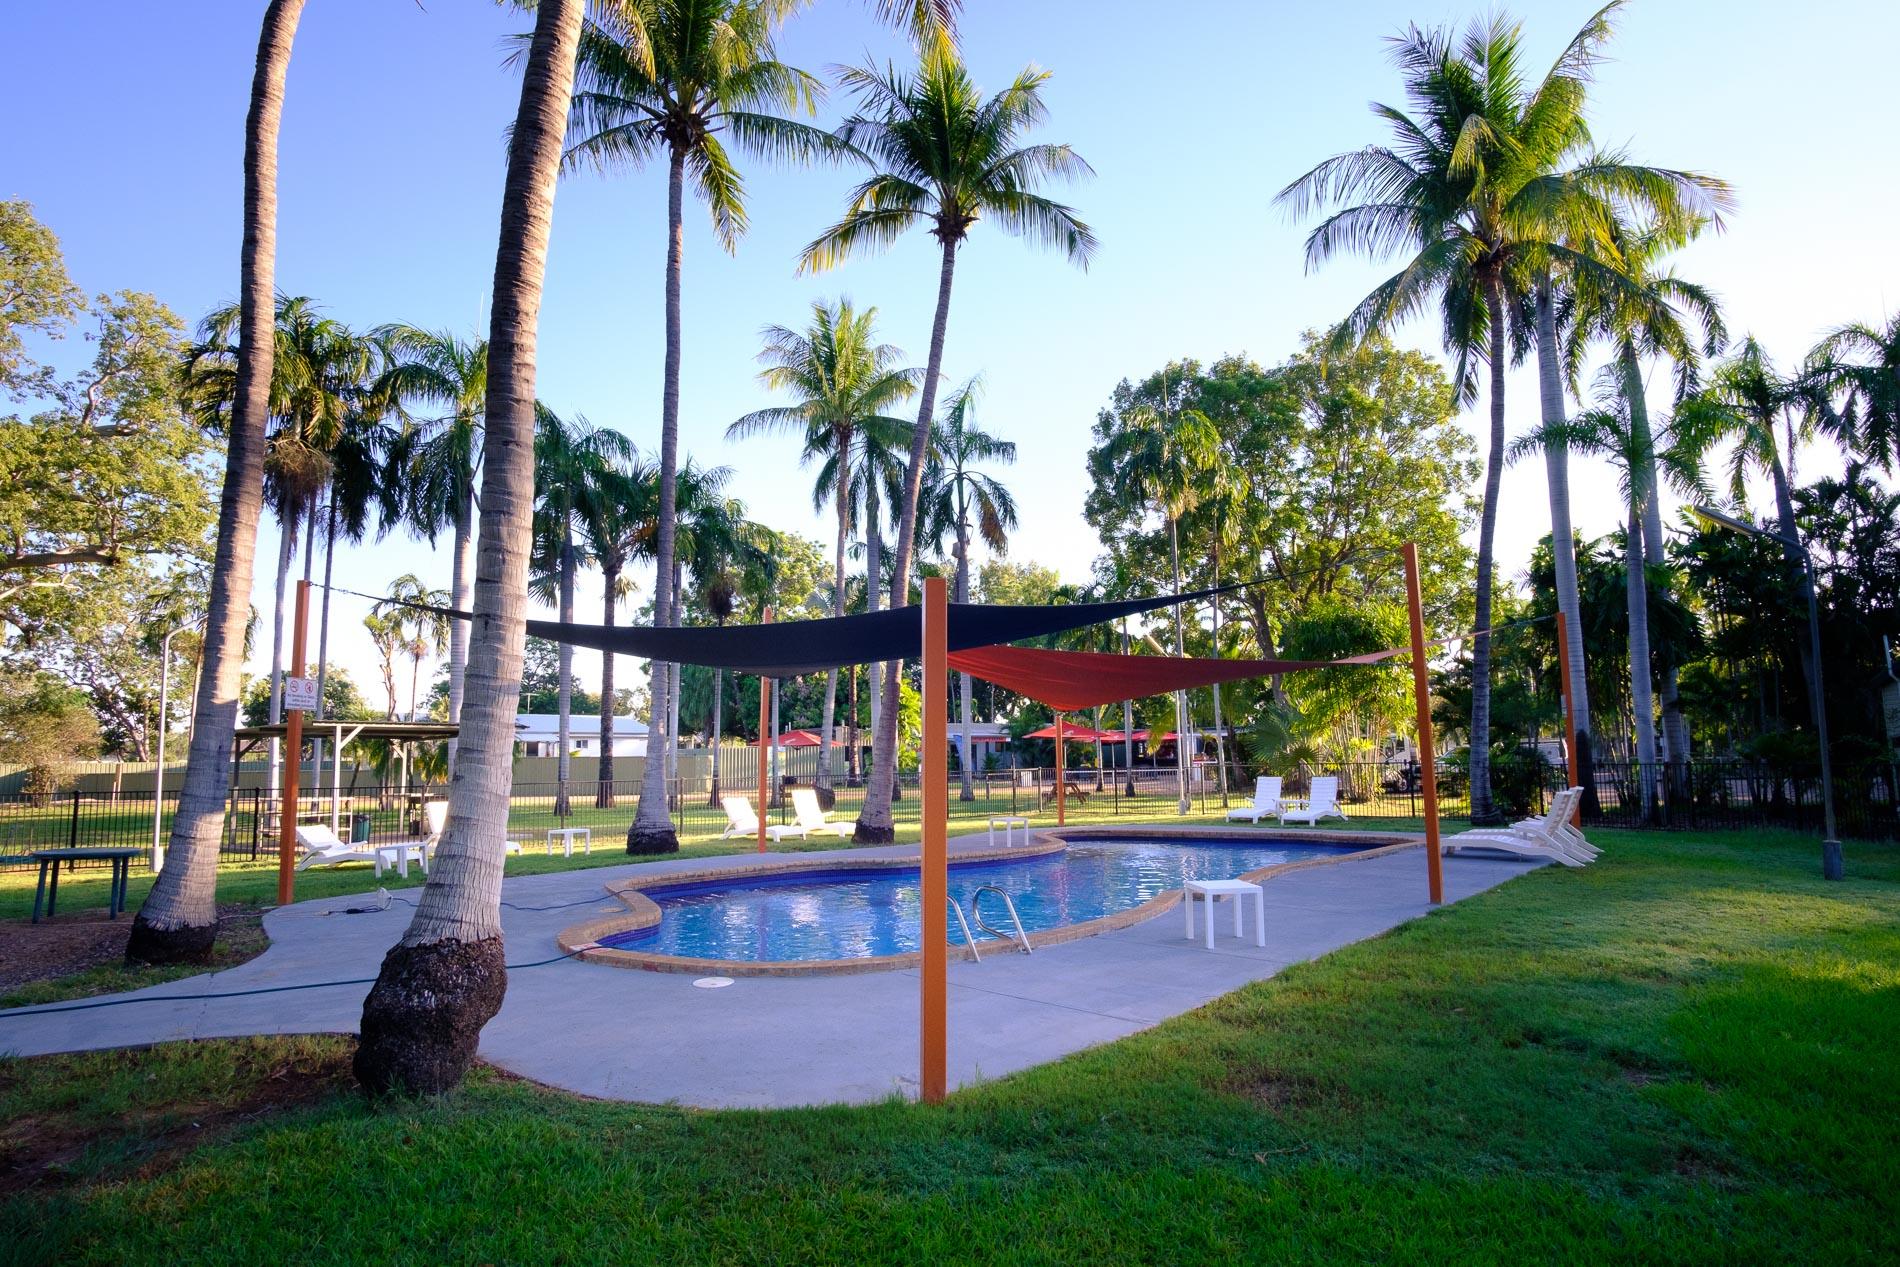 Blue Coconut Palm Pool at Kimberleyland